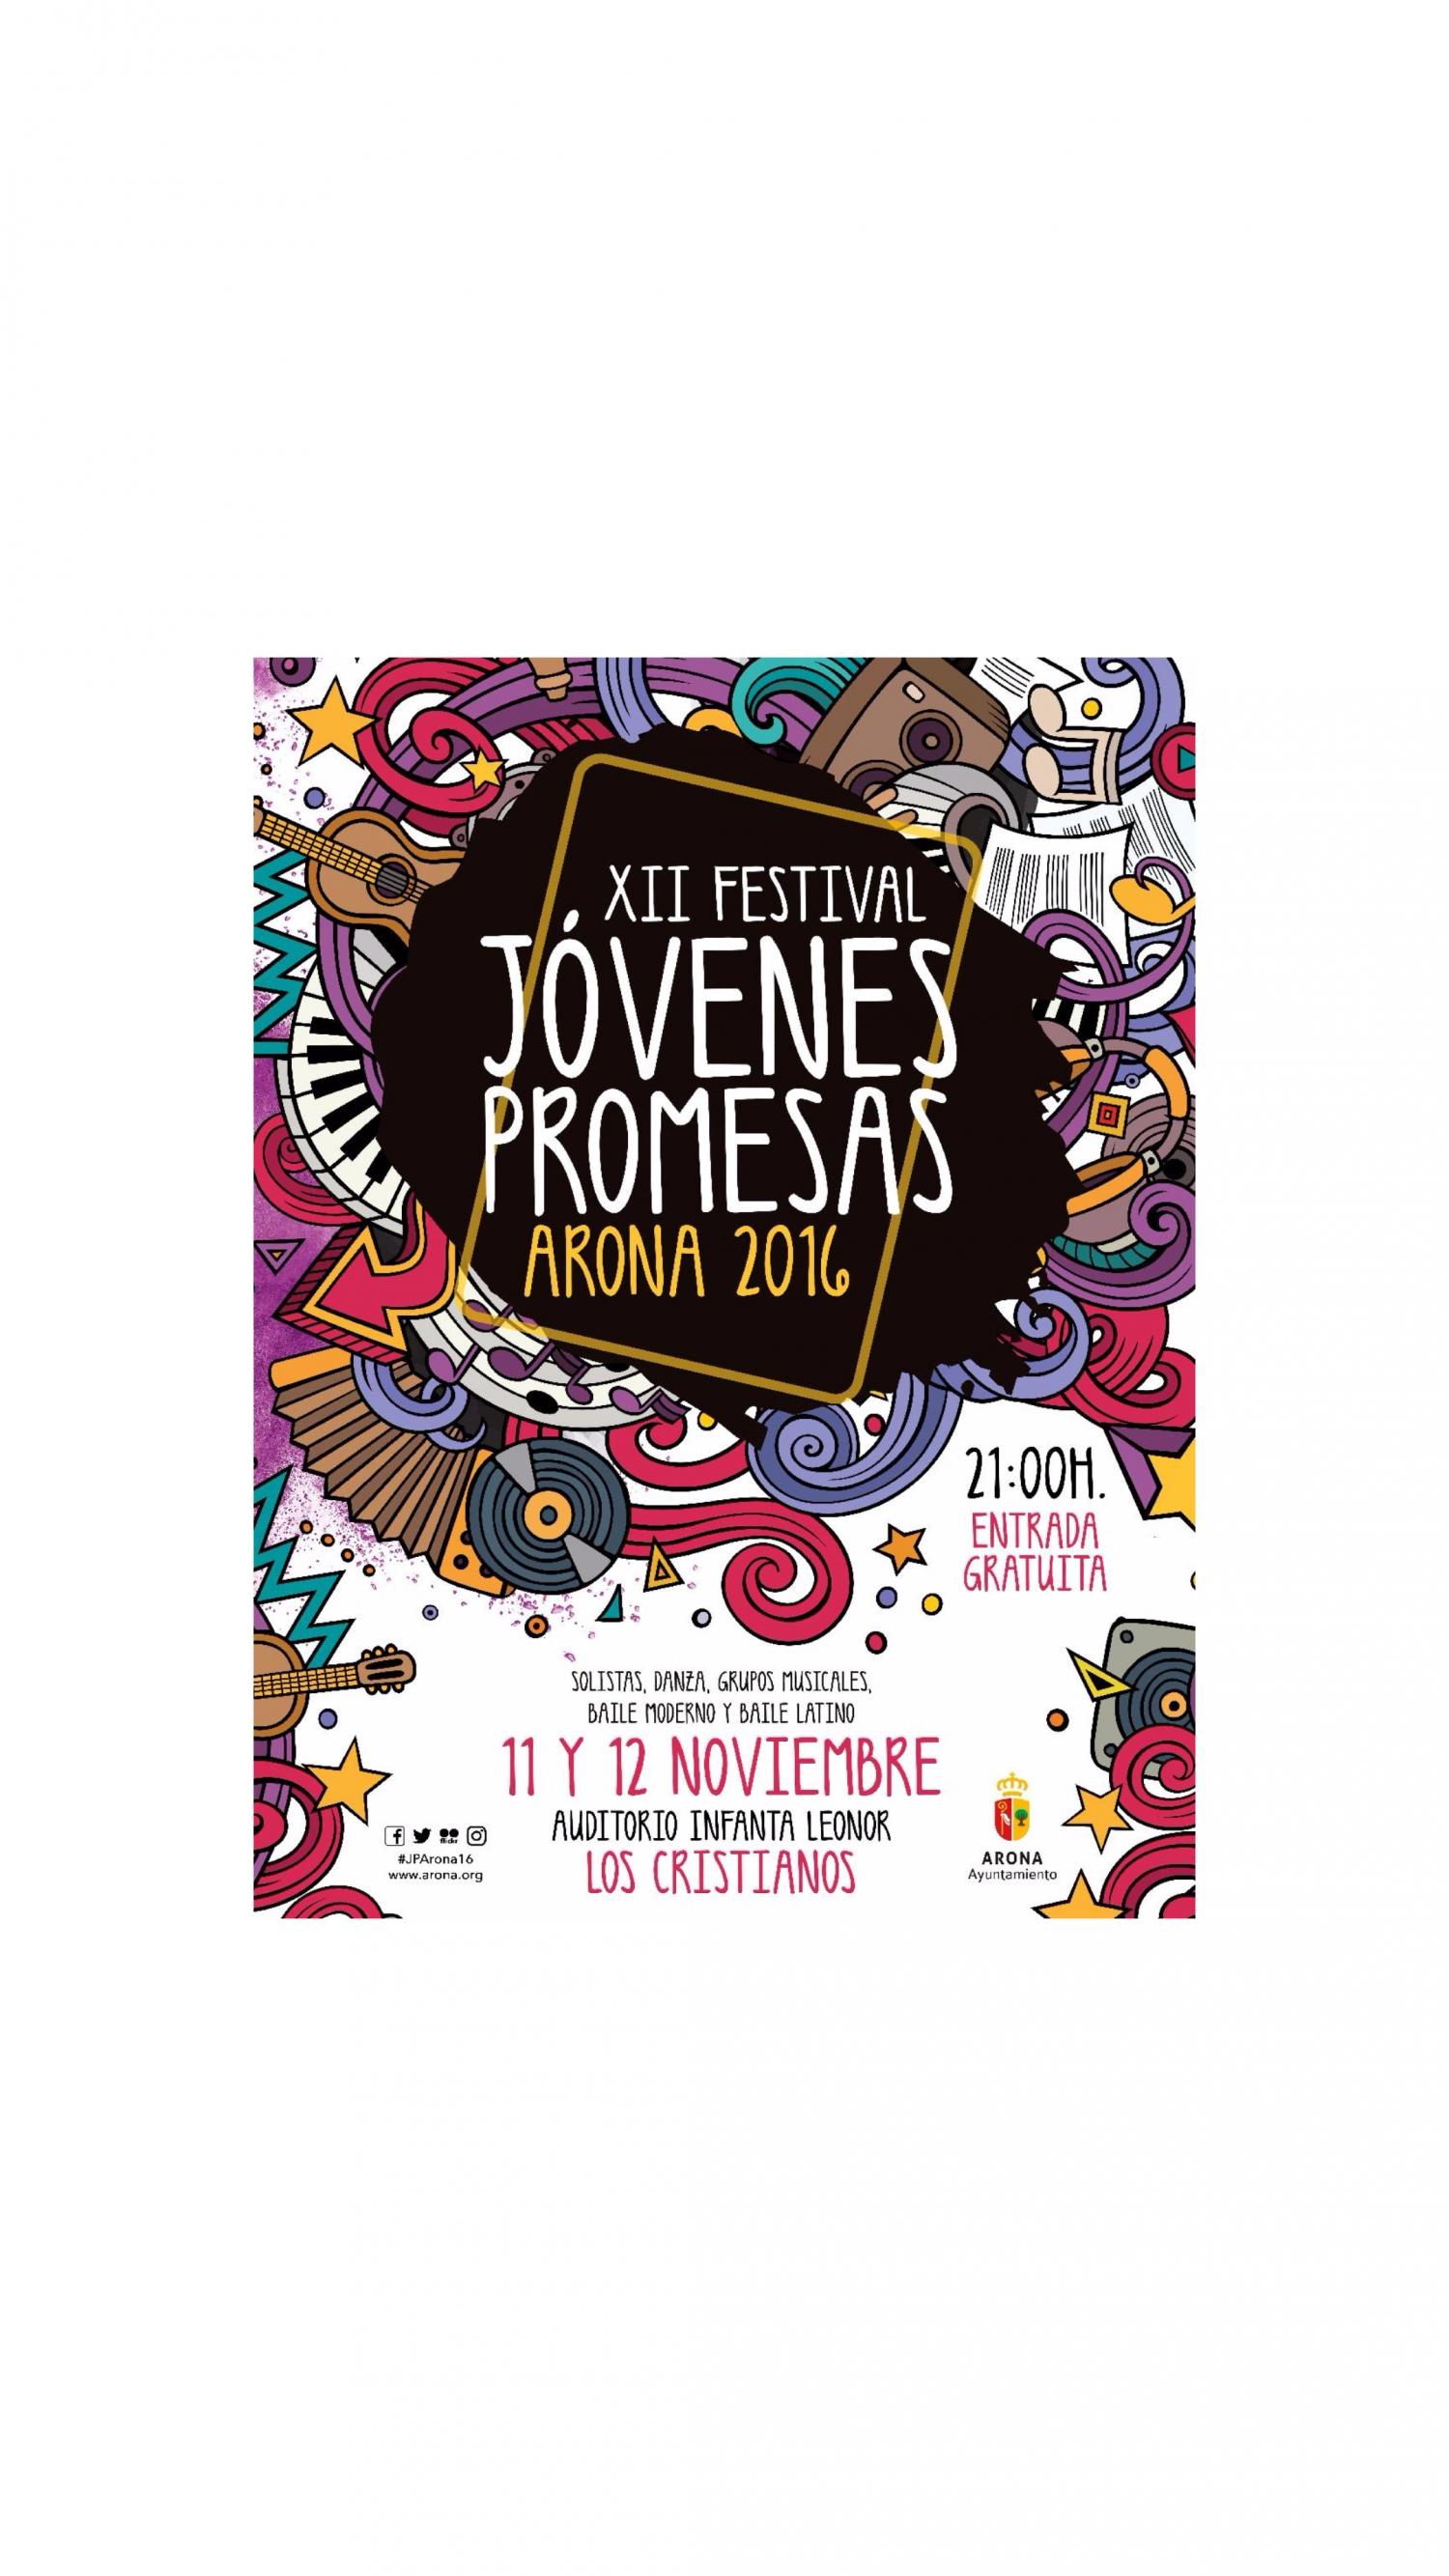 Promising Youths Festival Arona